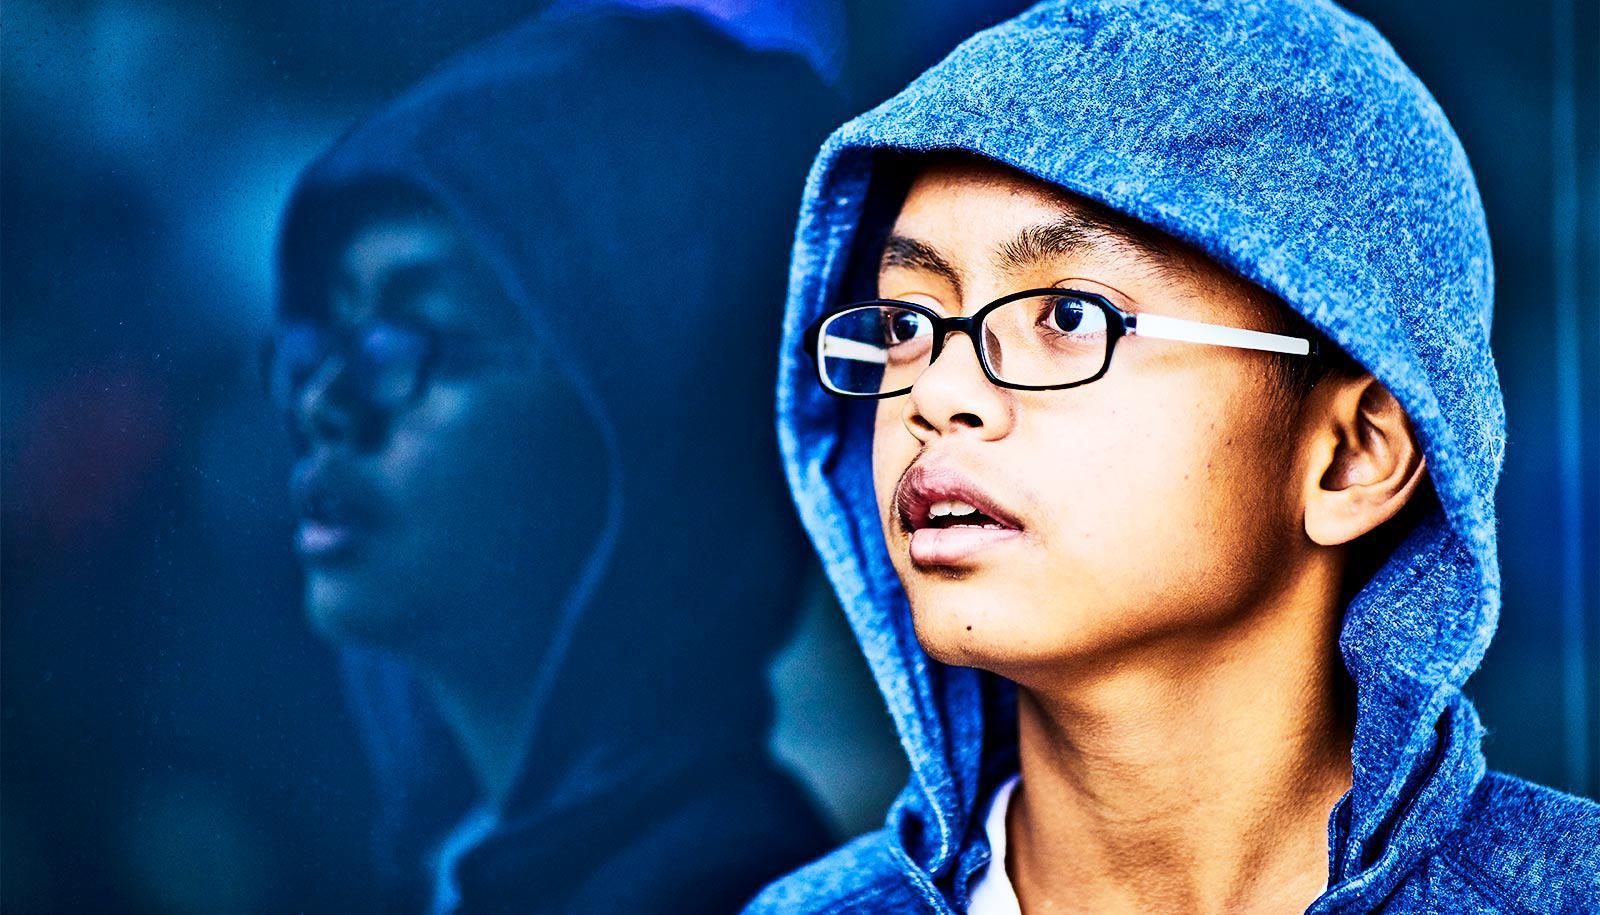 nervous student in blue hoodie